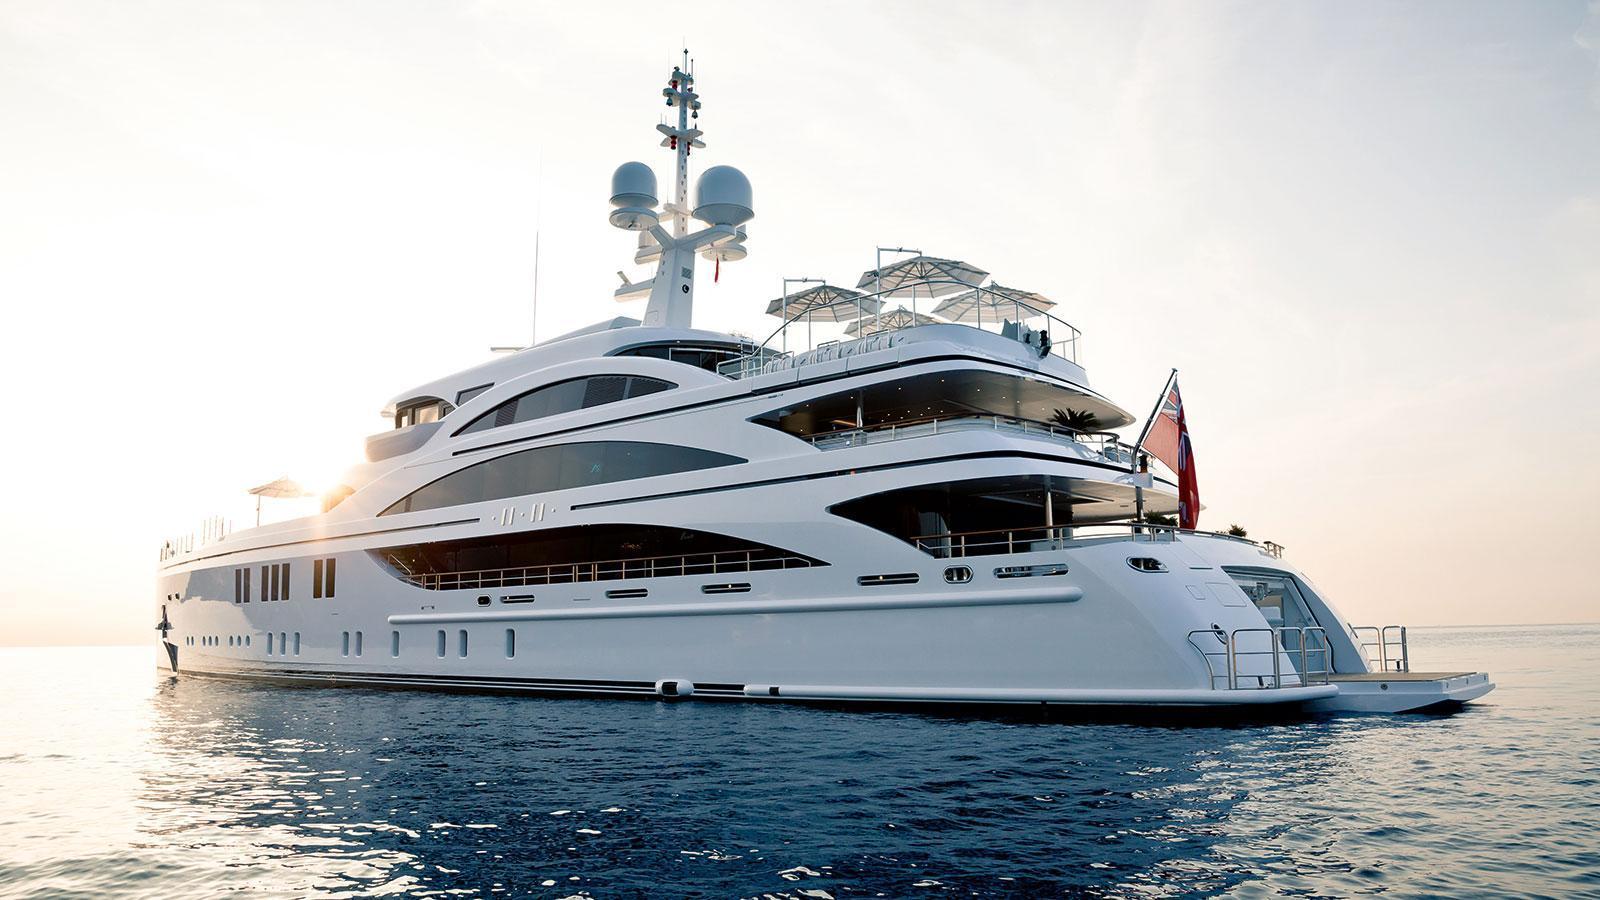 1111-motor-yacht-benetti-2015-63m-hal-profile-stern